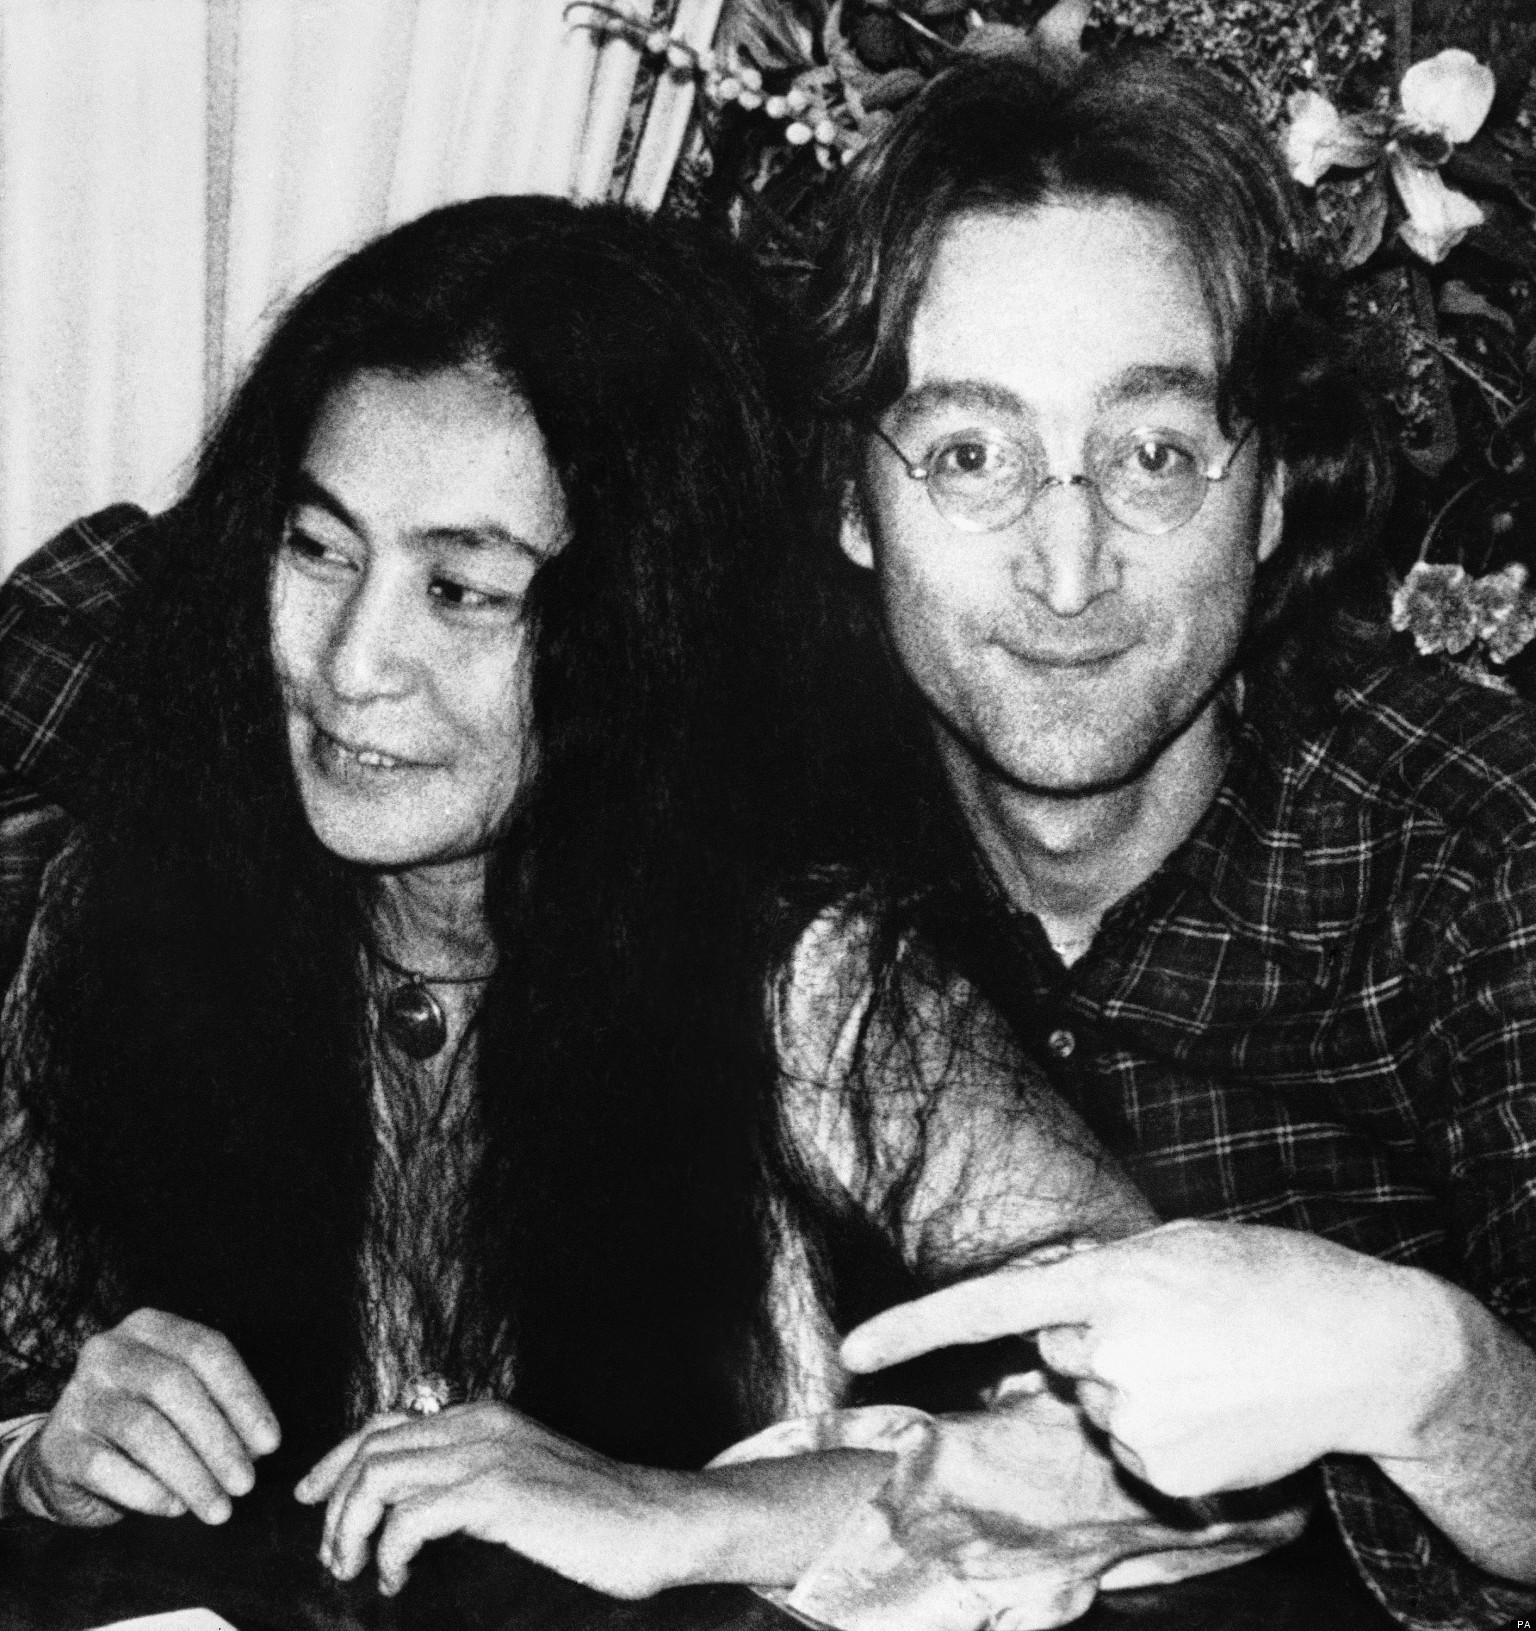 Yoko Ono And John Lennon Yoko Ono Celebr...